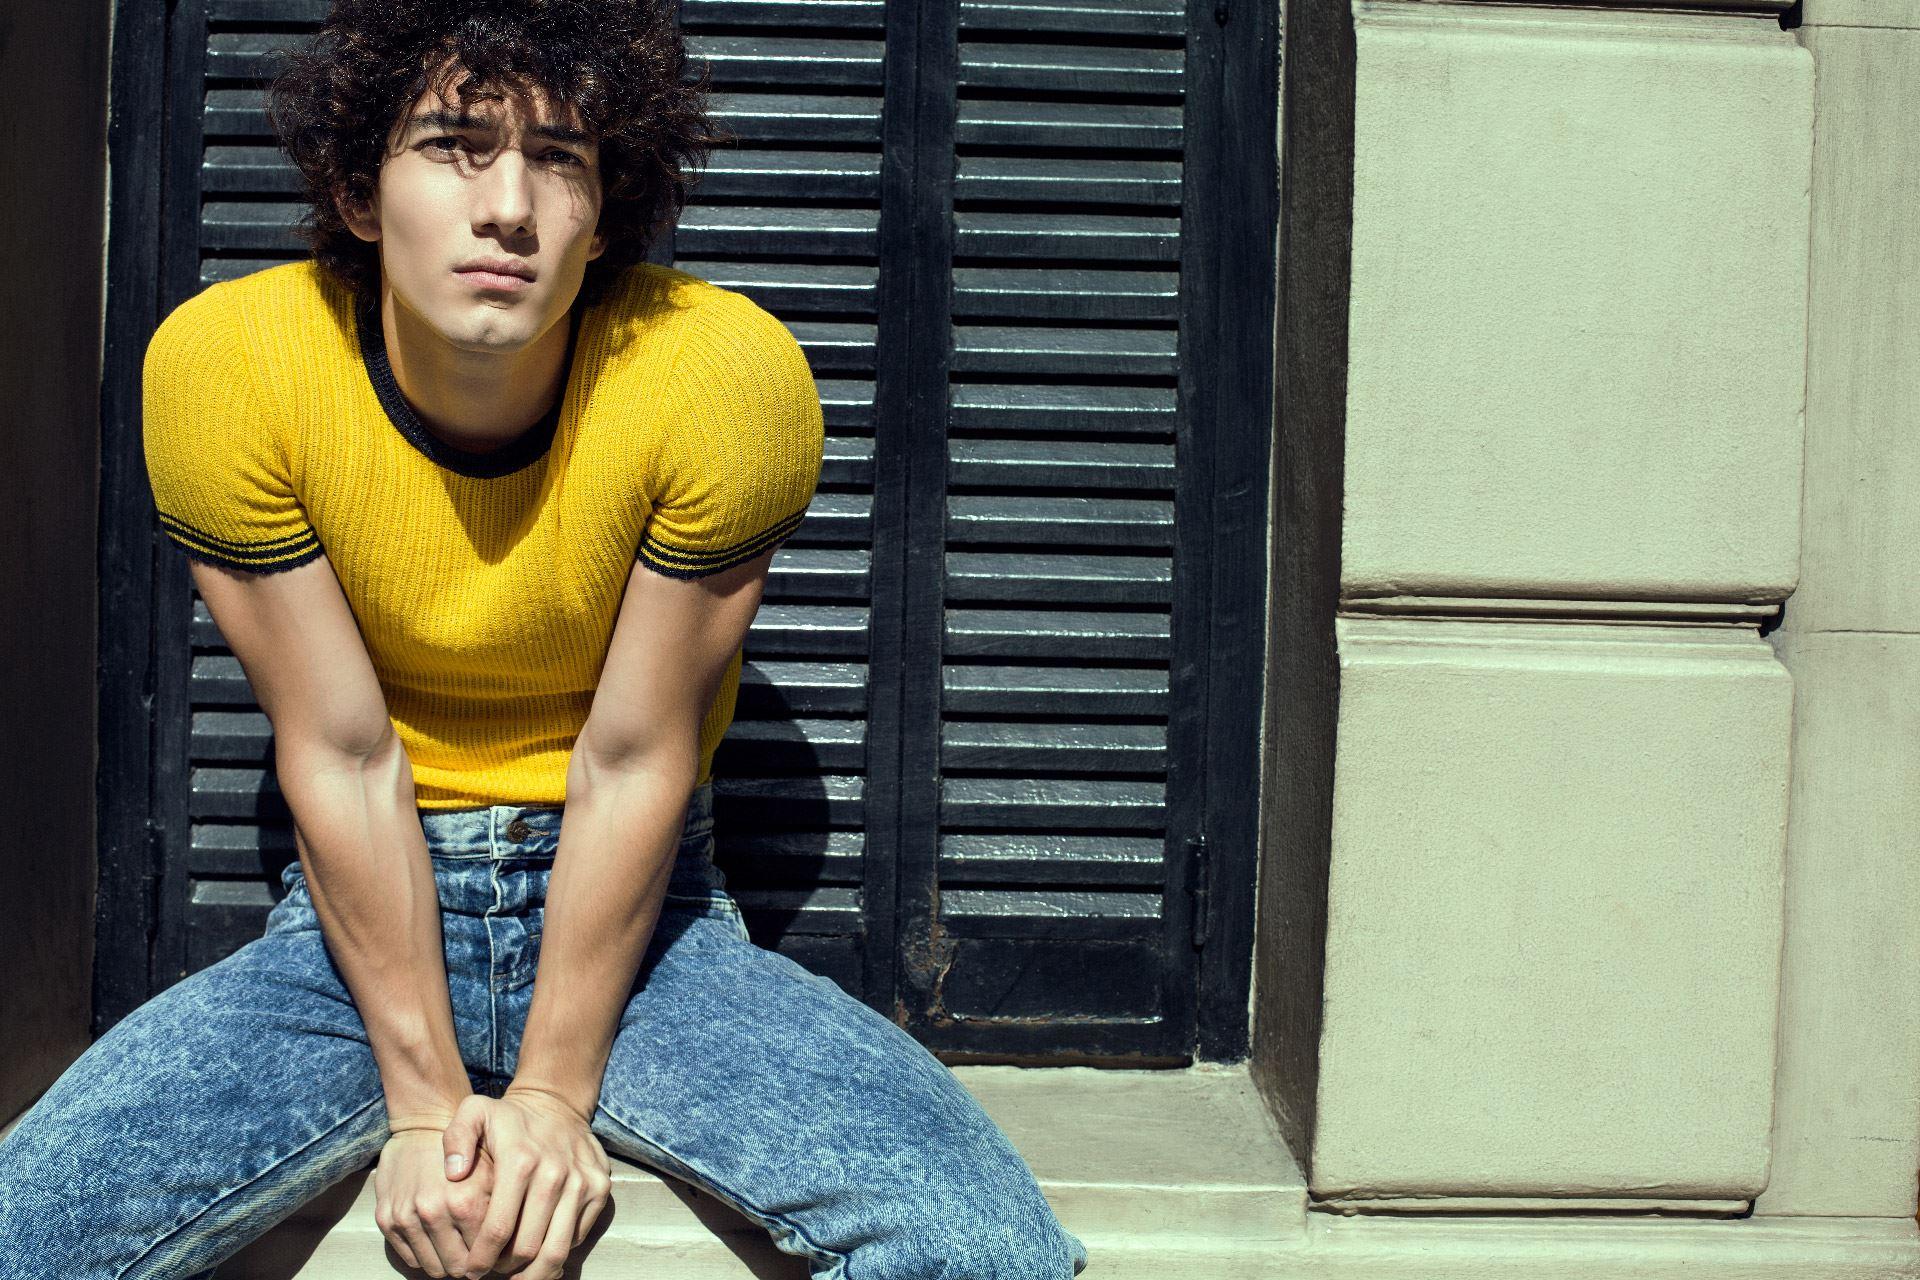 jorge lopez actor modelo chile argentina moda